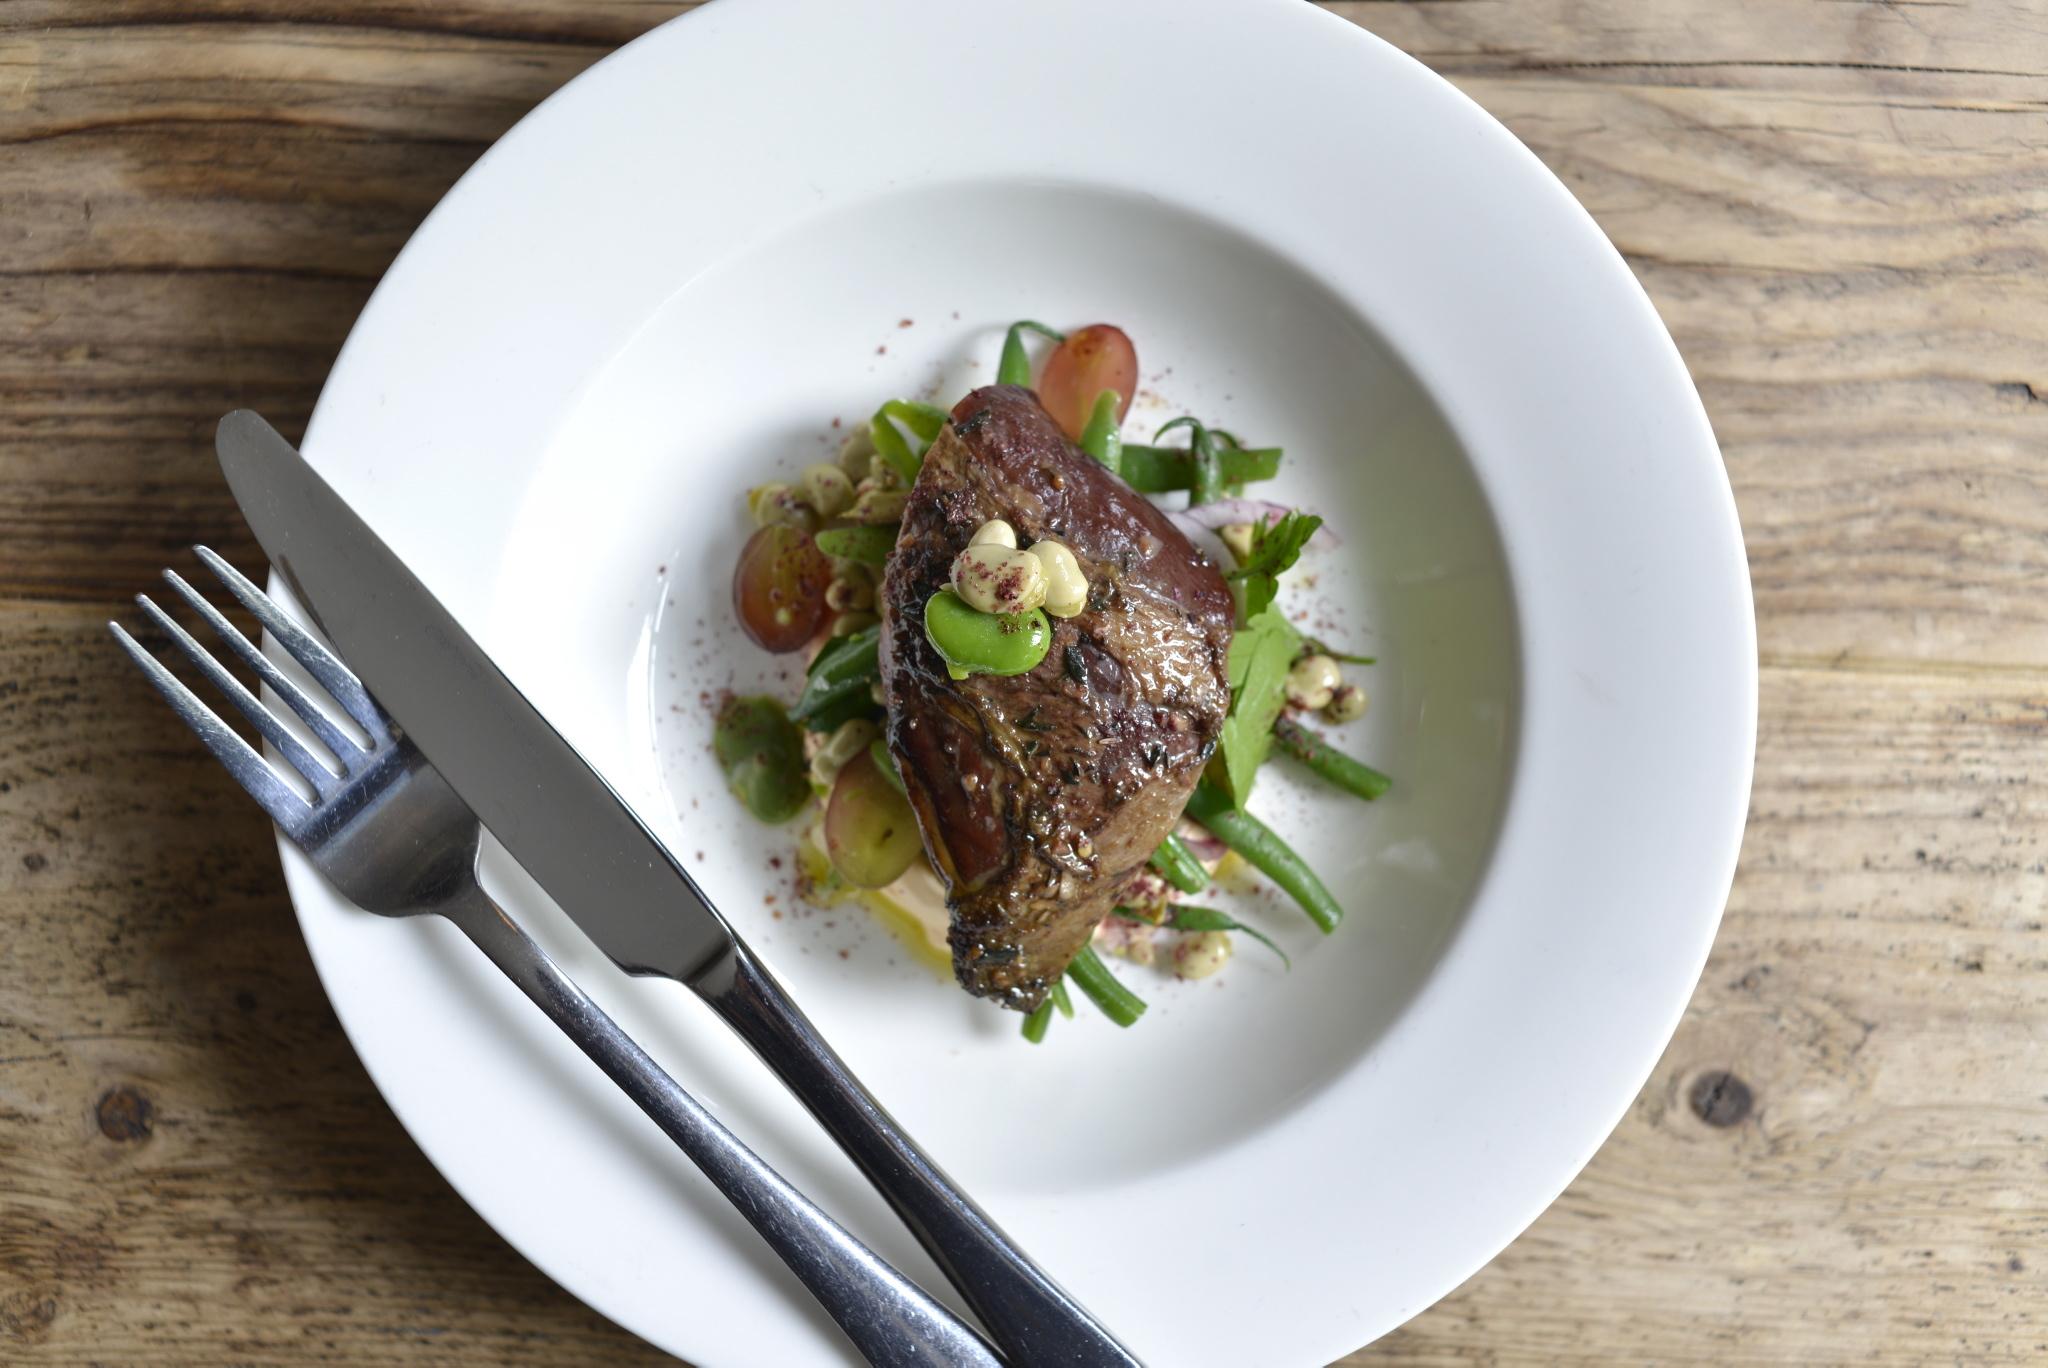 The 20 best new London restaurants